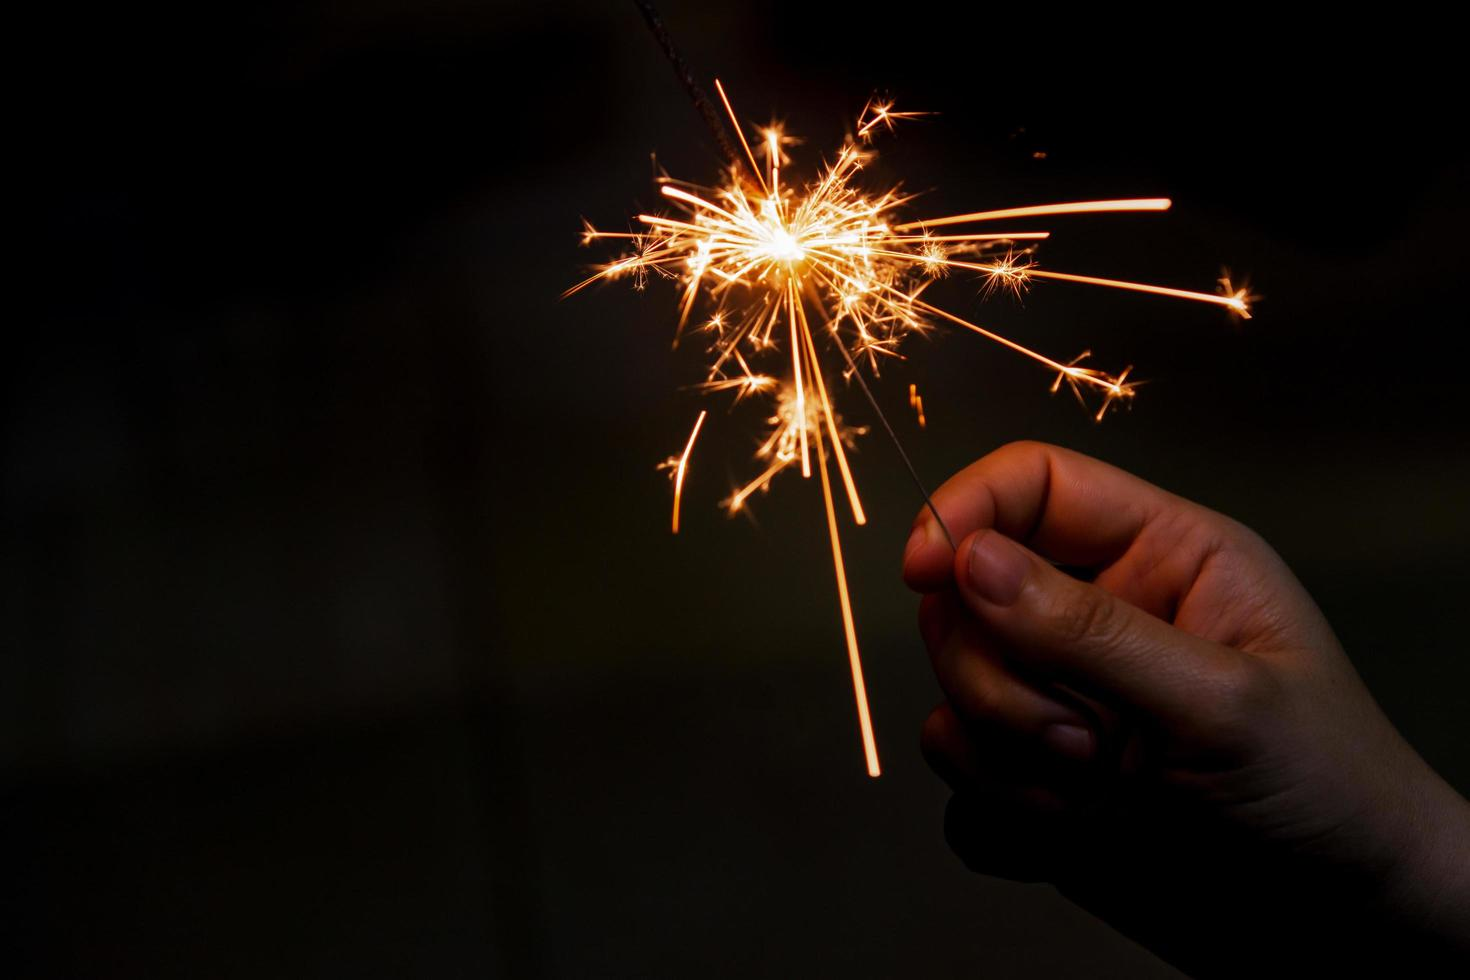 Female hand holding a burning sparkler, Christmas and new year sparkler holiday background photo